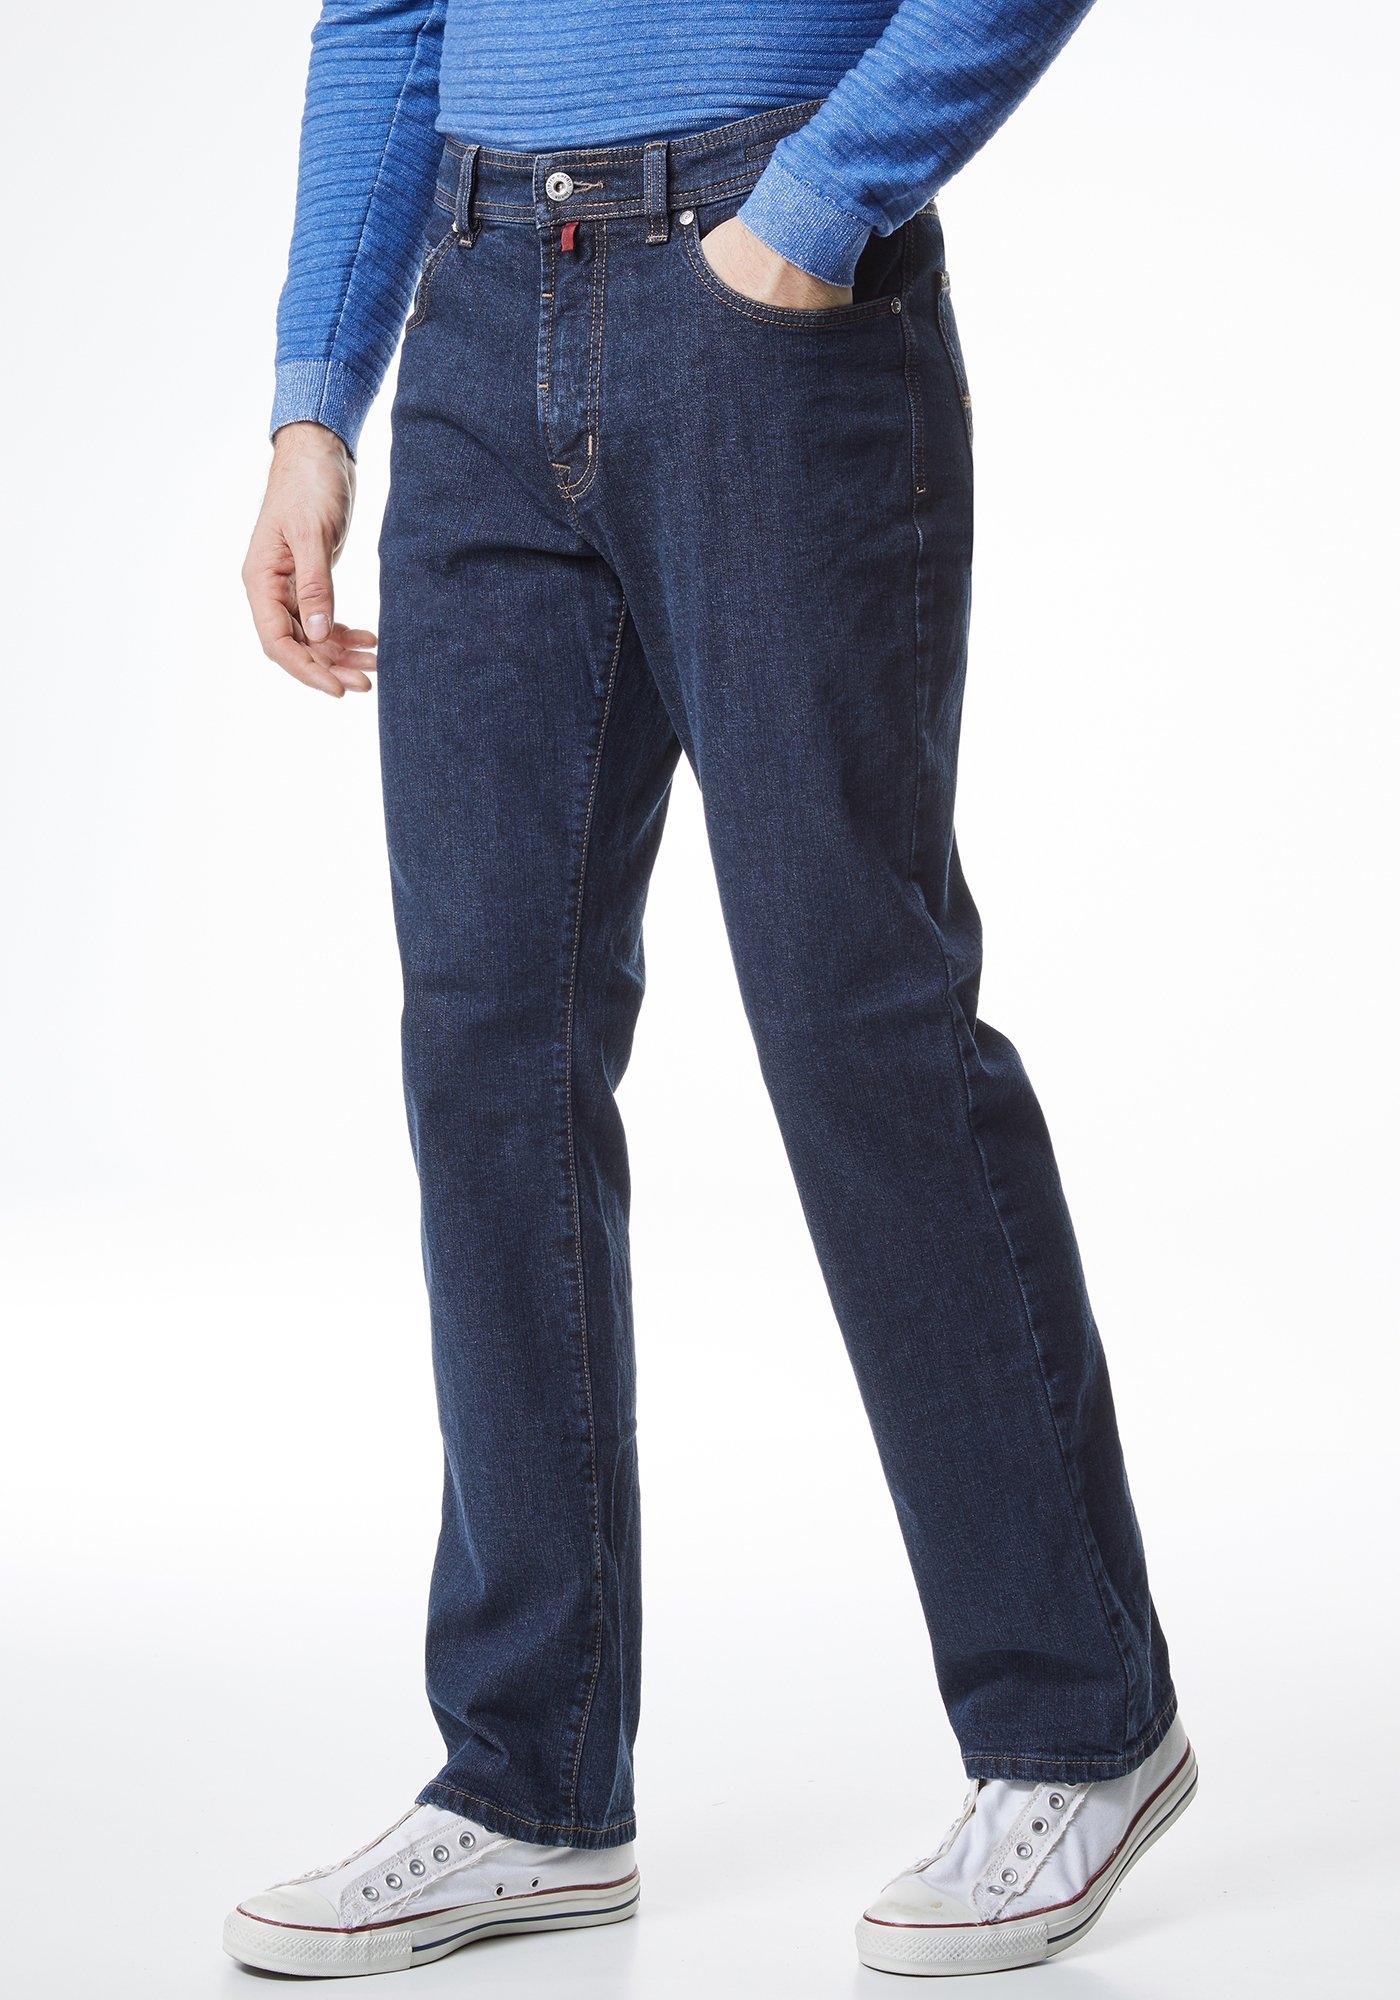 Pierre Cardin Dark Denim Jeans »Dijon« goedkoop op otto.nl kopen